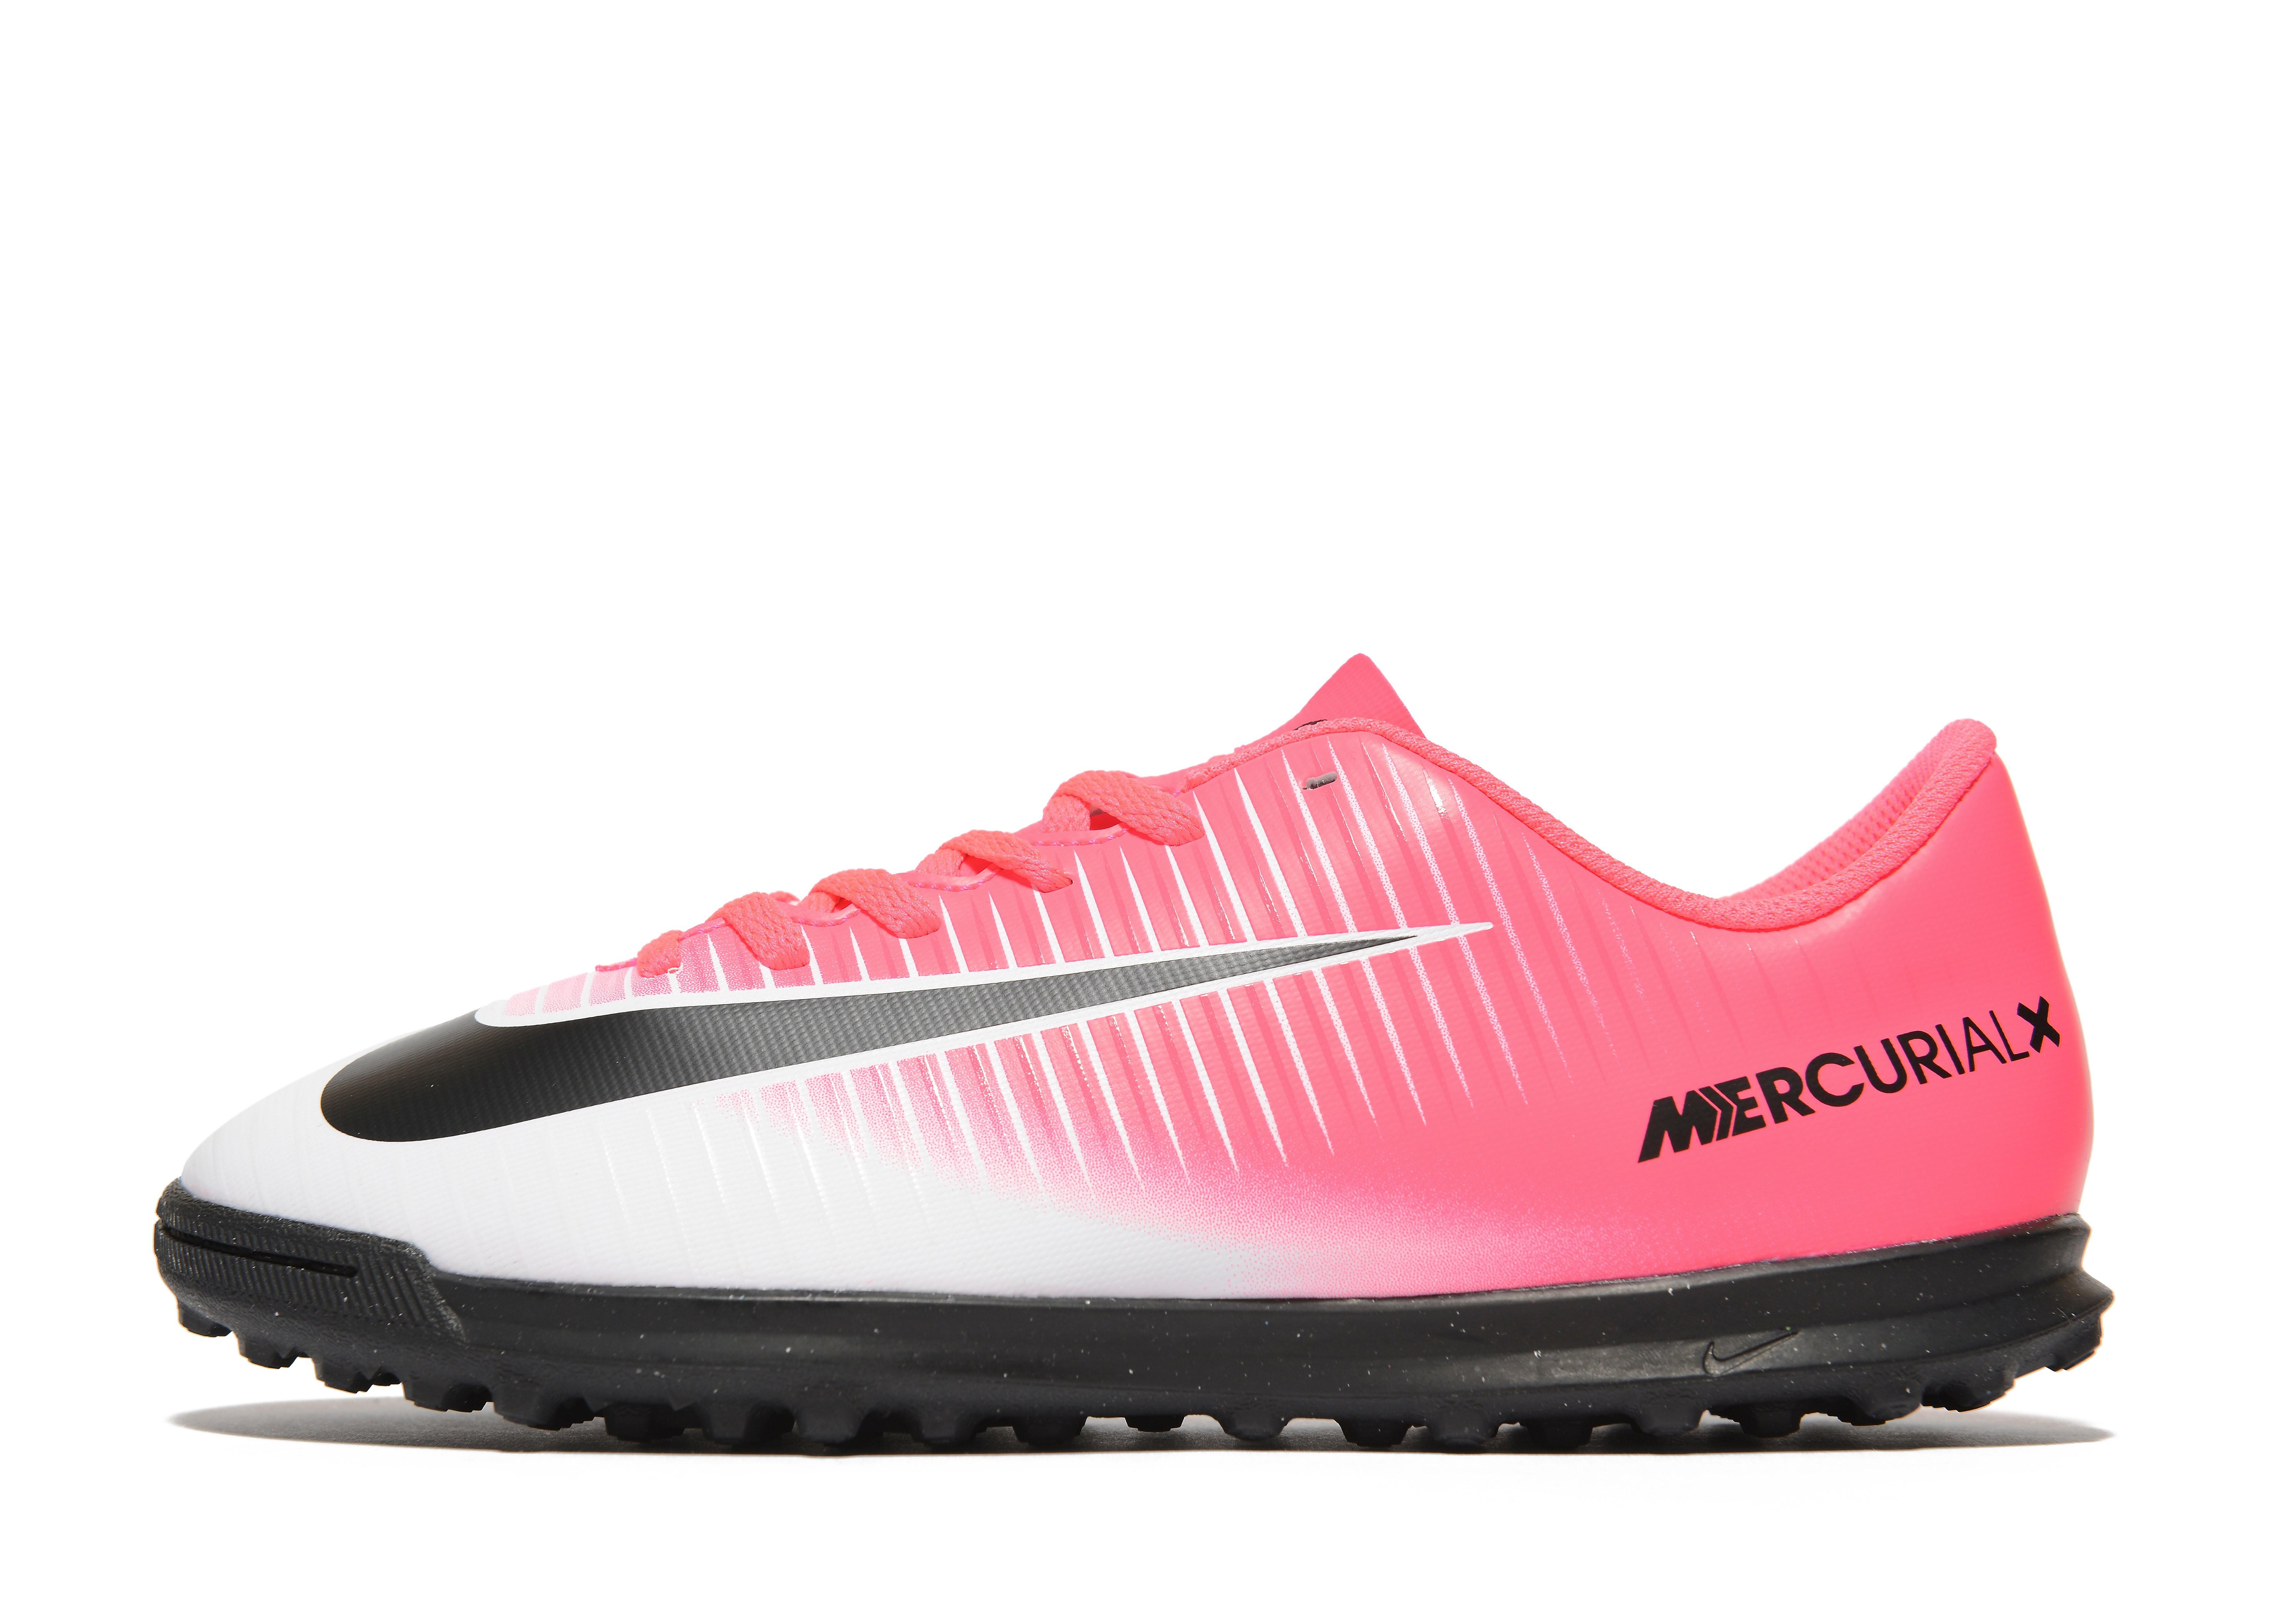 Nike Motion Blur Mercurial Vortex Turf Junior